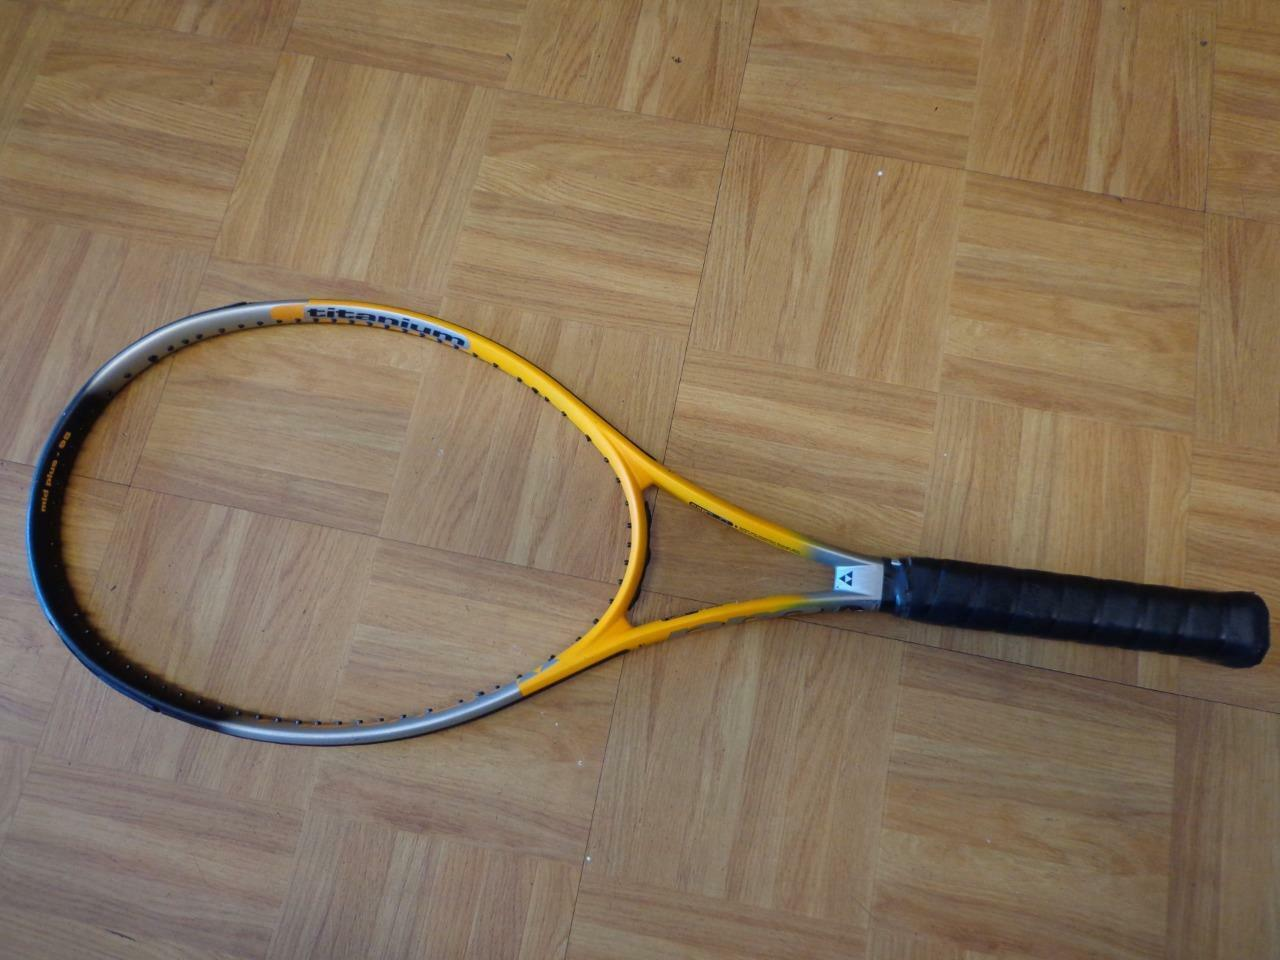 Fishcer Classic Pro Speed Titanium 95 head 4 1 2 grip nice shape Tennis Racquet